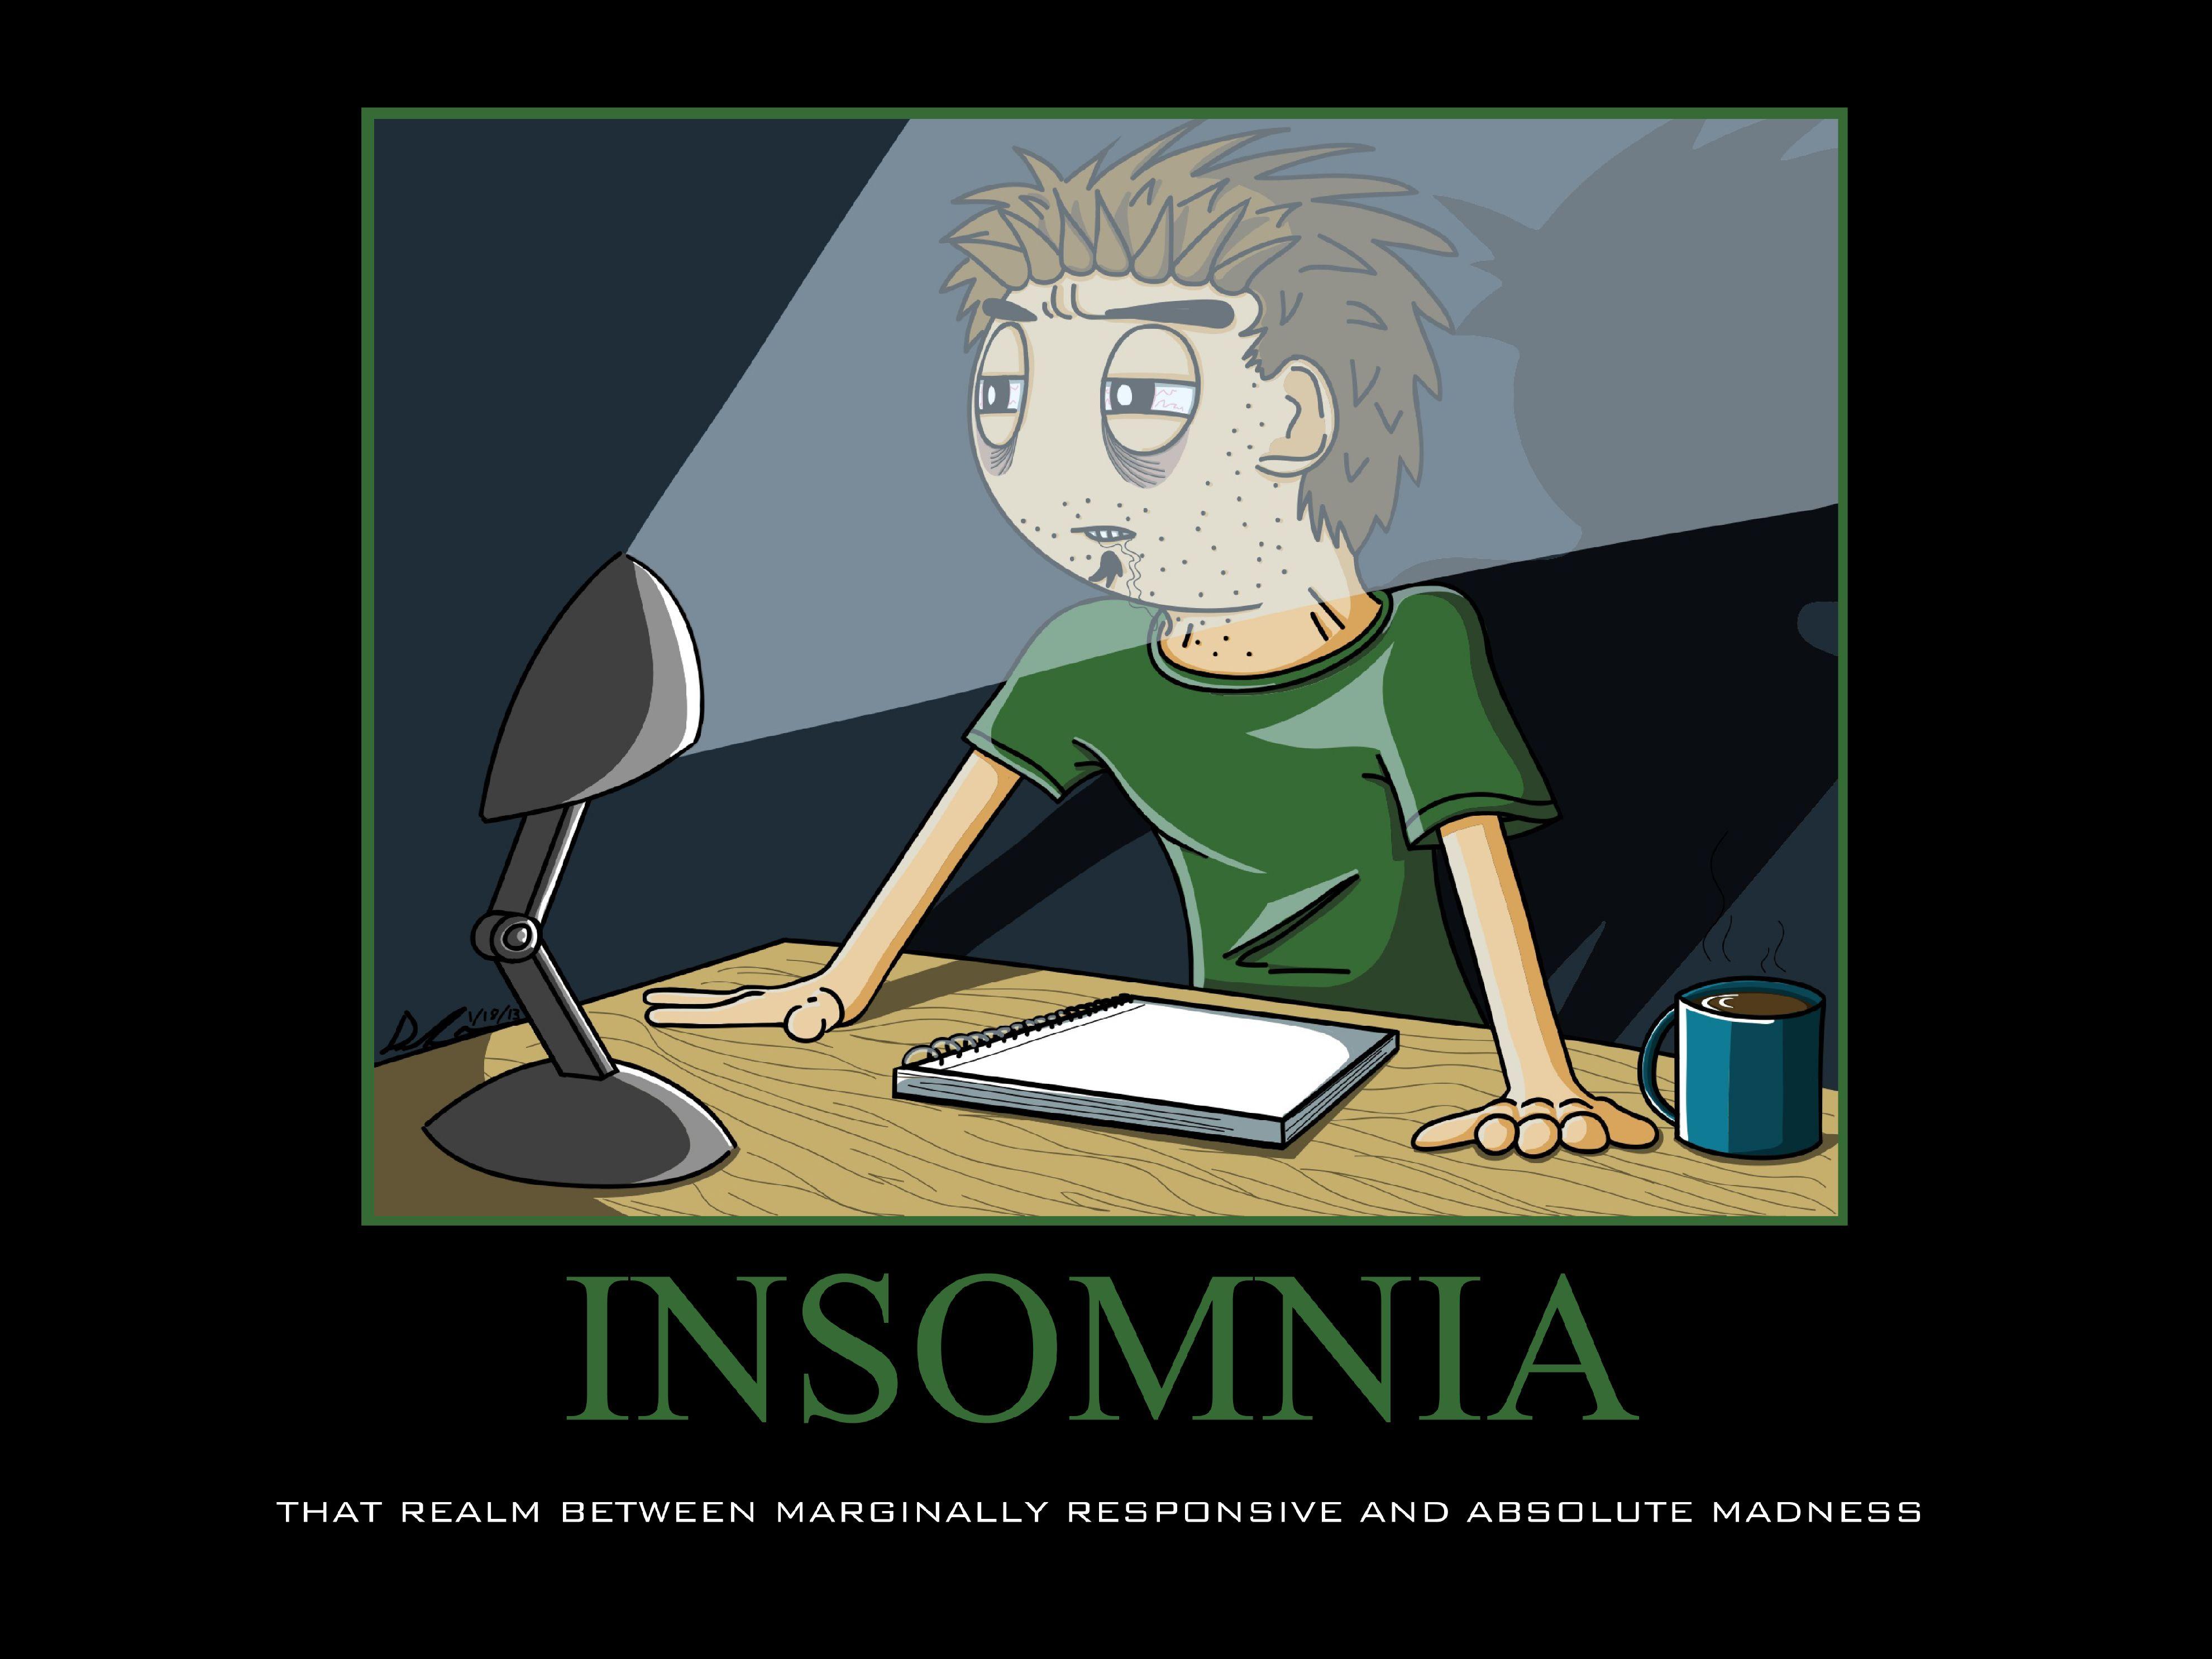 Insomnia, Insomnia